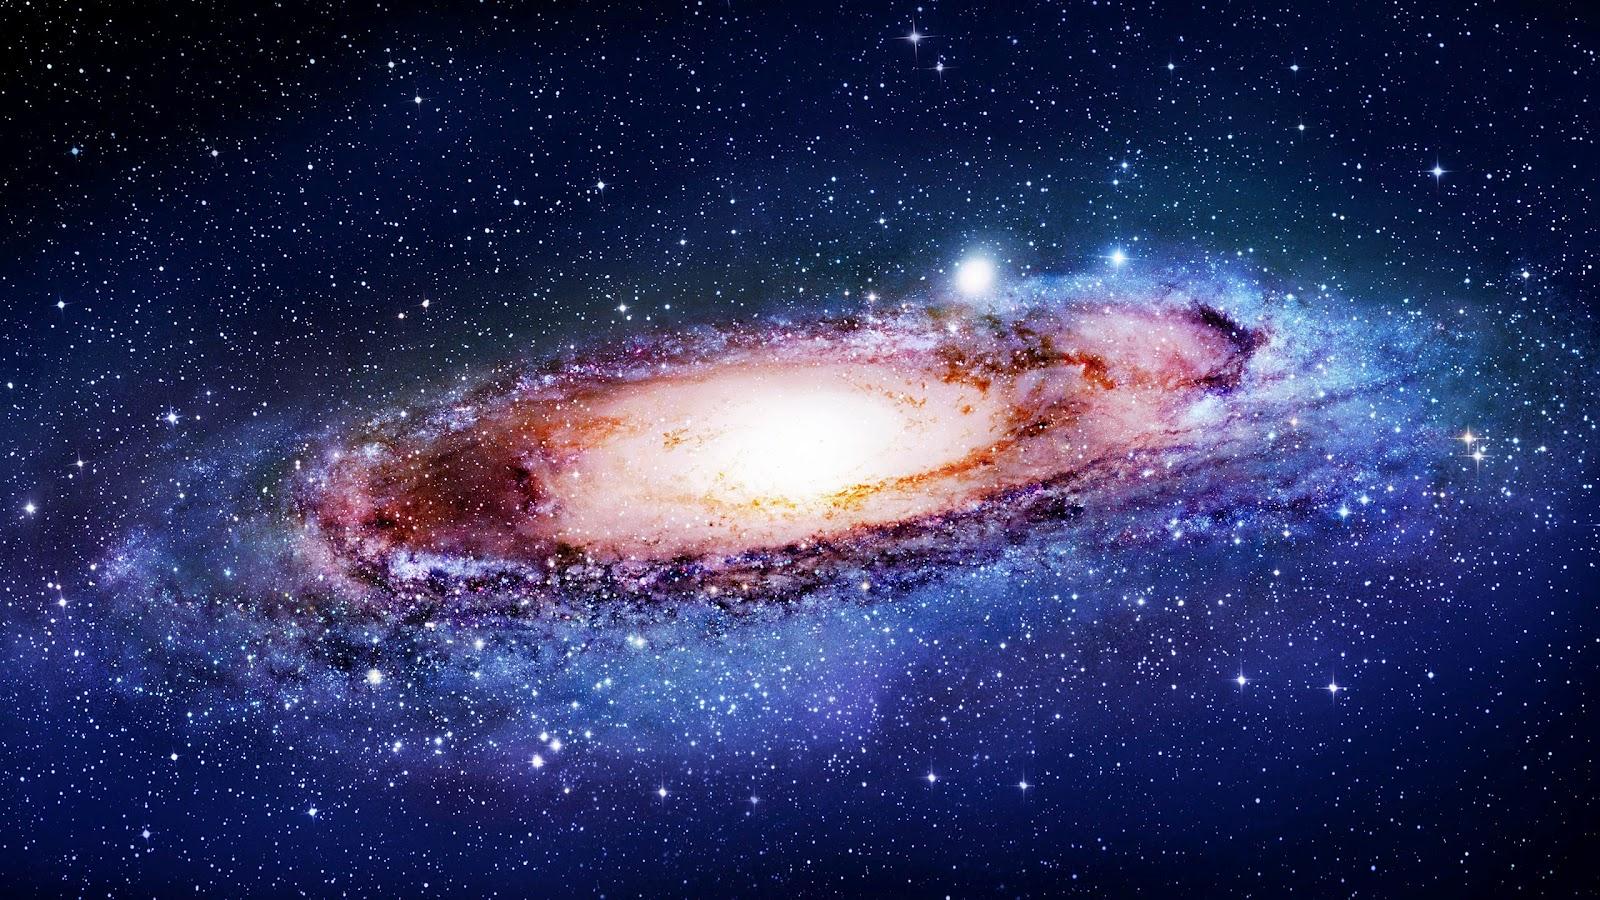 Galaxy Computer Wallpaper Download Andromeda Galaxy 1600x900